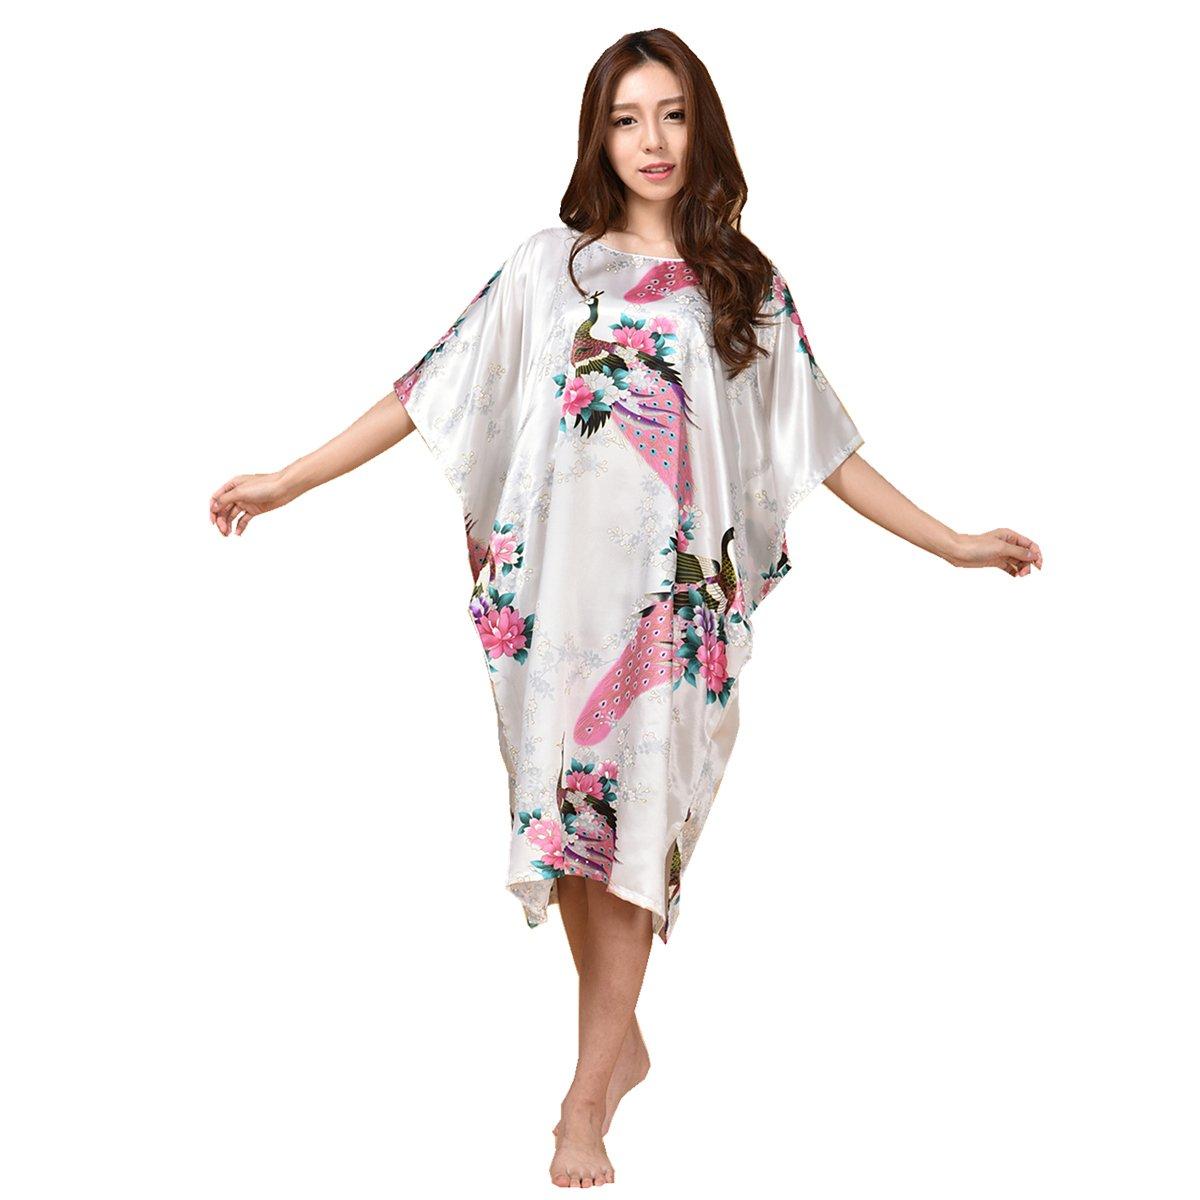 GL&G Animal pattern lady silk bathrobe thin section pajamas printing single skirt loose large yards home service comfortable white bathrobes,white,One size